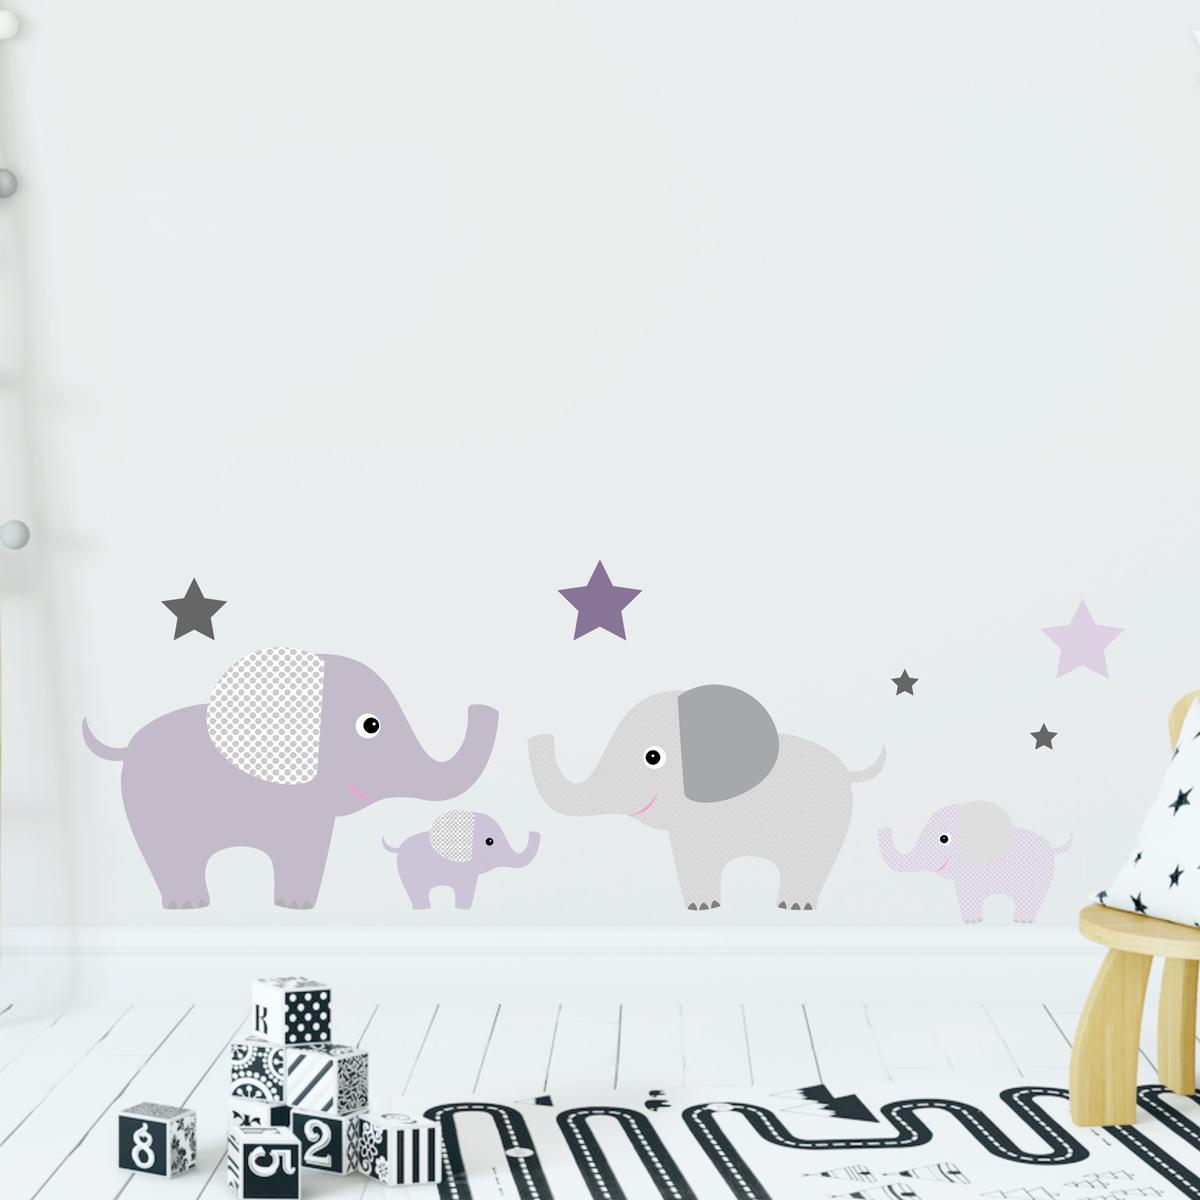 Greenluup wandsticker elefanten in lila flieder violett grau wandsticker kinderzimmer - Wandsticker elefant ...